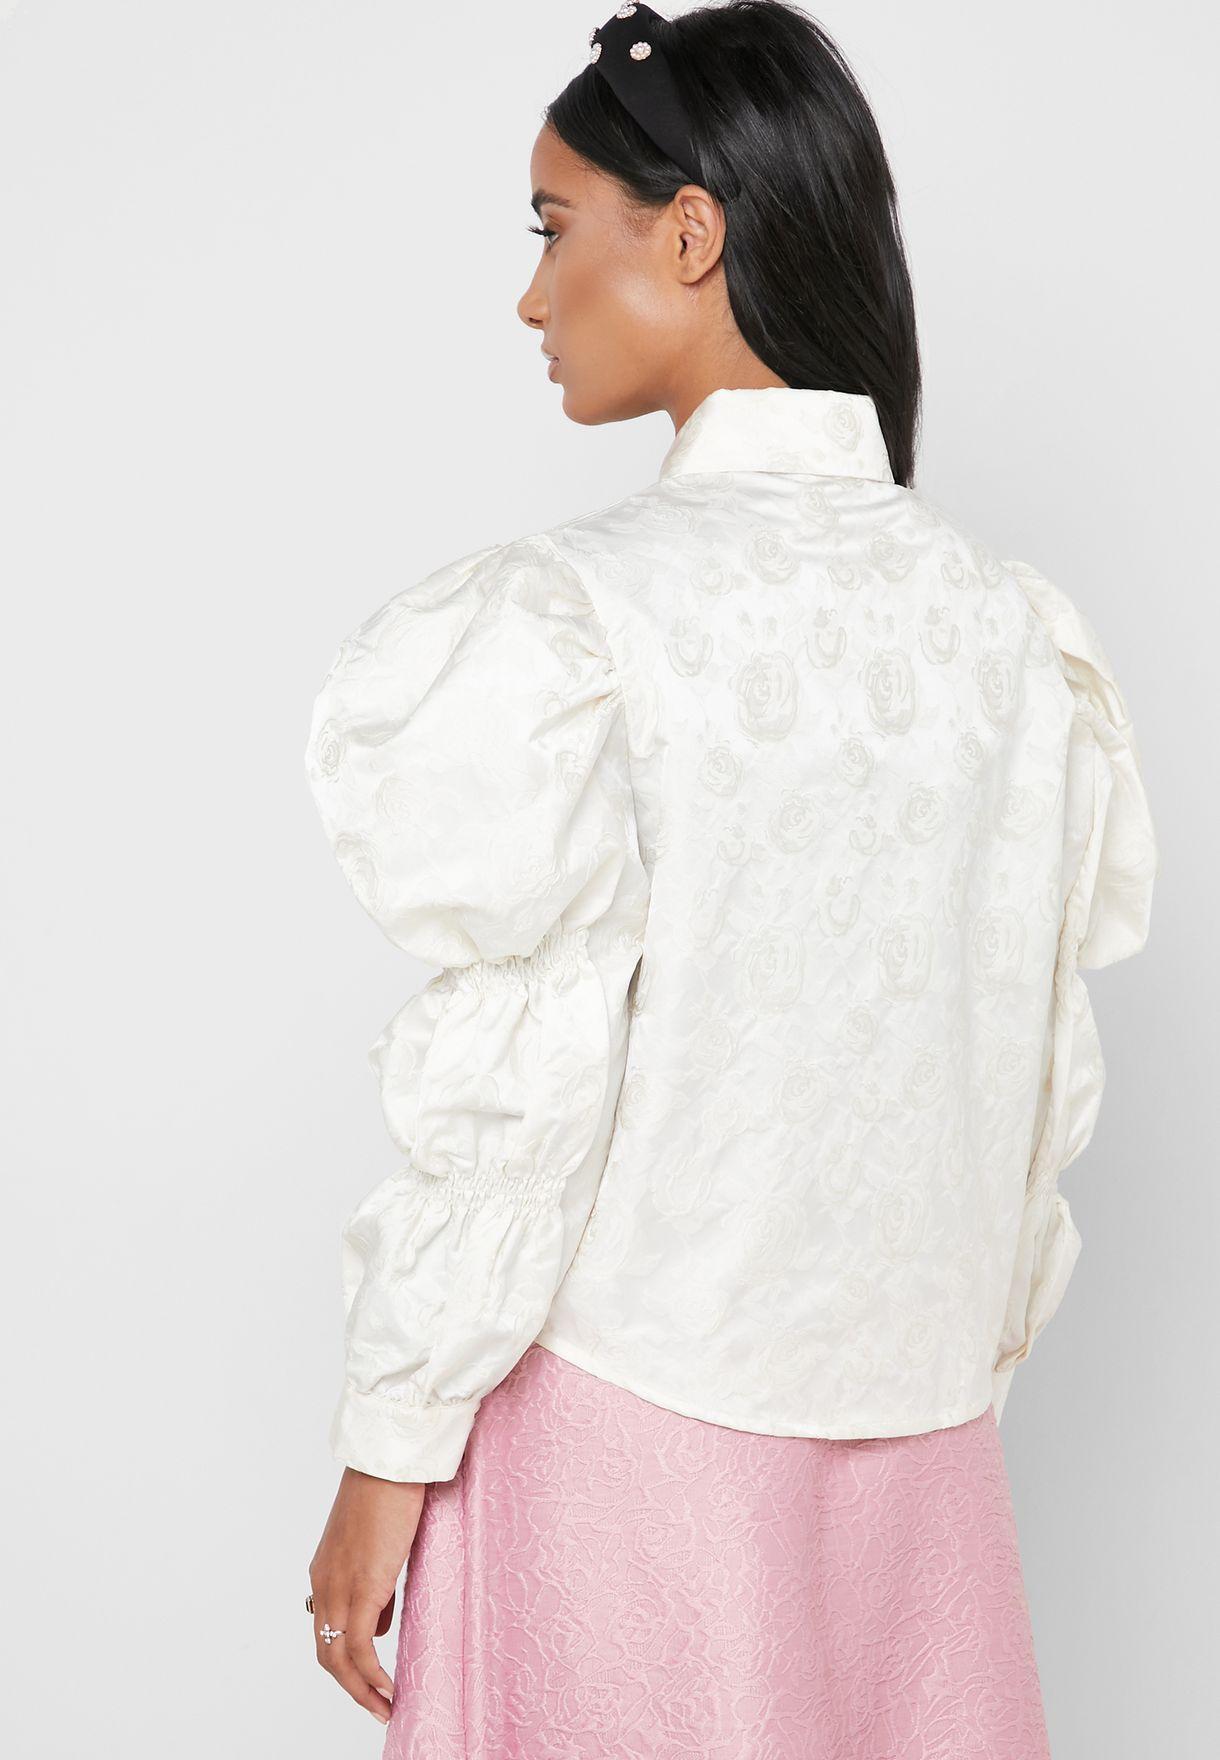 Buy Sister Jane White Jacquard Puff Sleeve Shirt For Women, Uae 19960at26jip